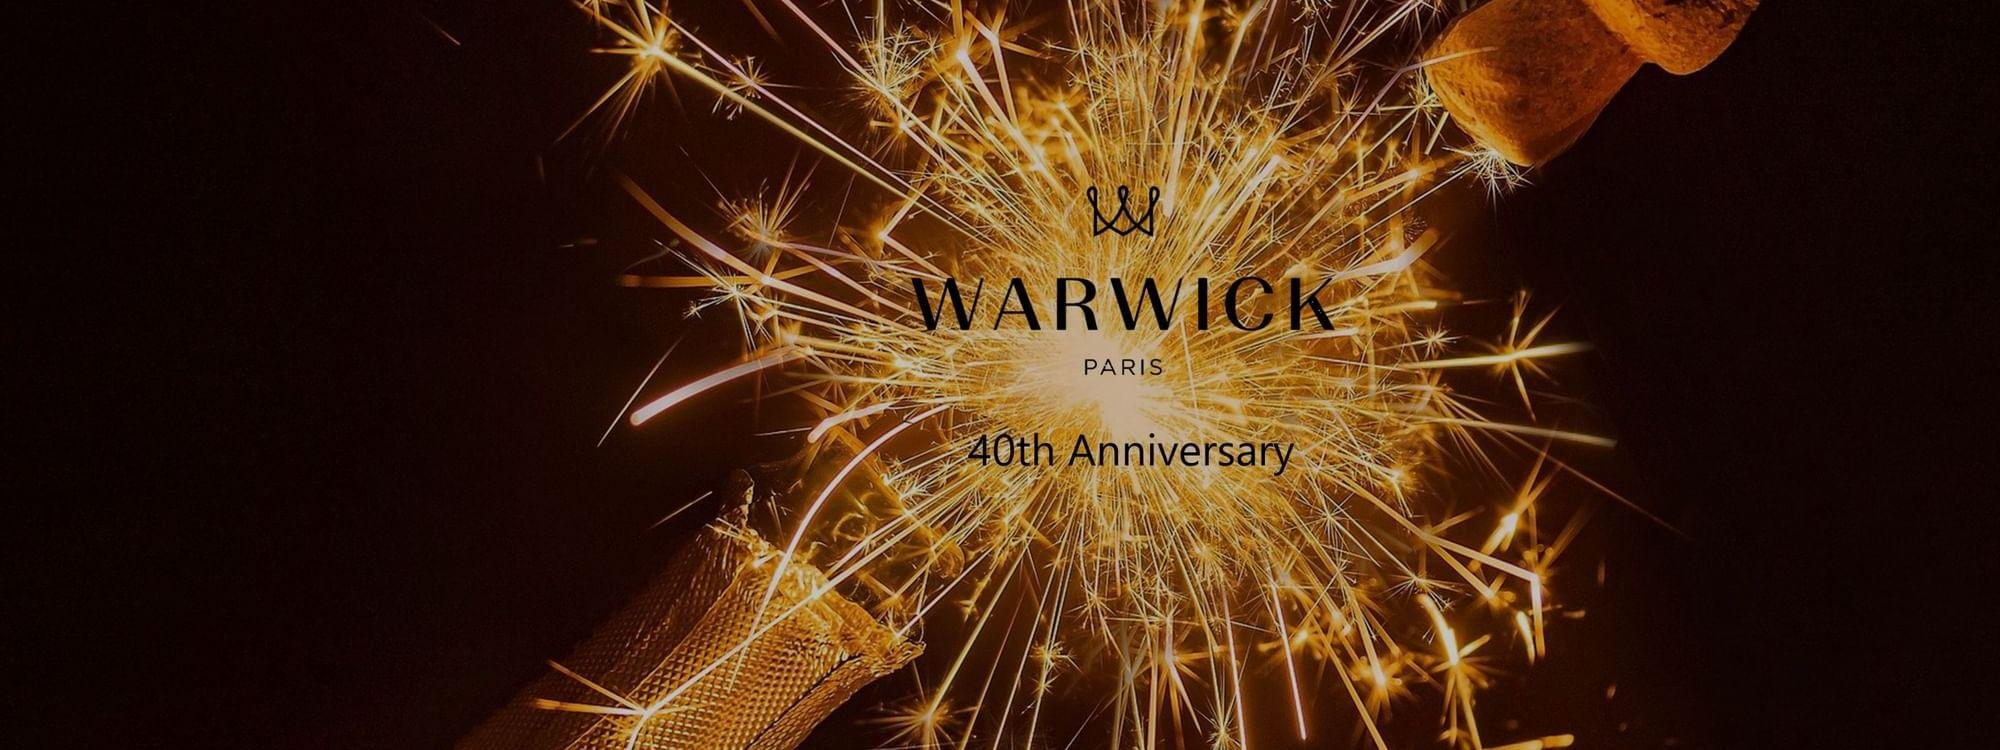 40th anniversary Warwick Paris